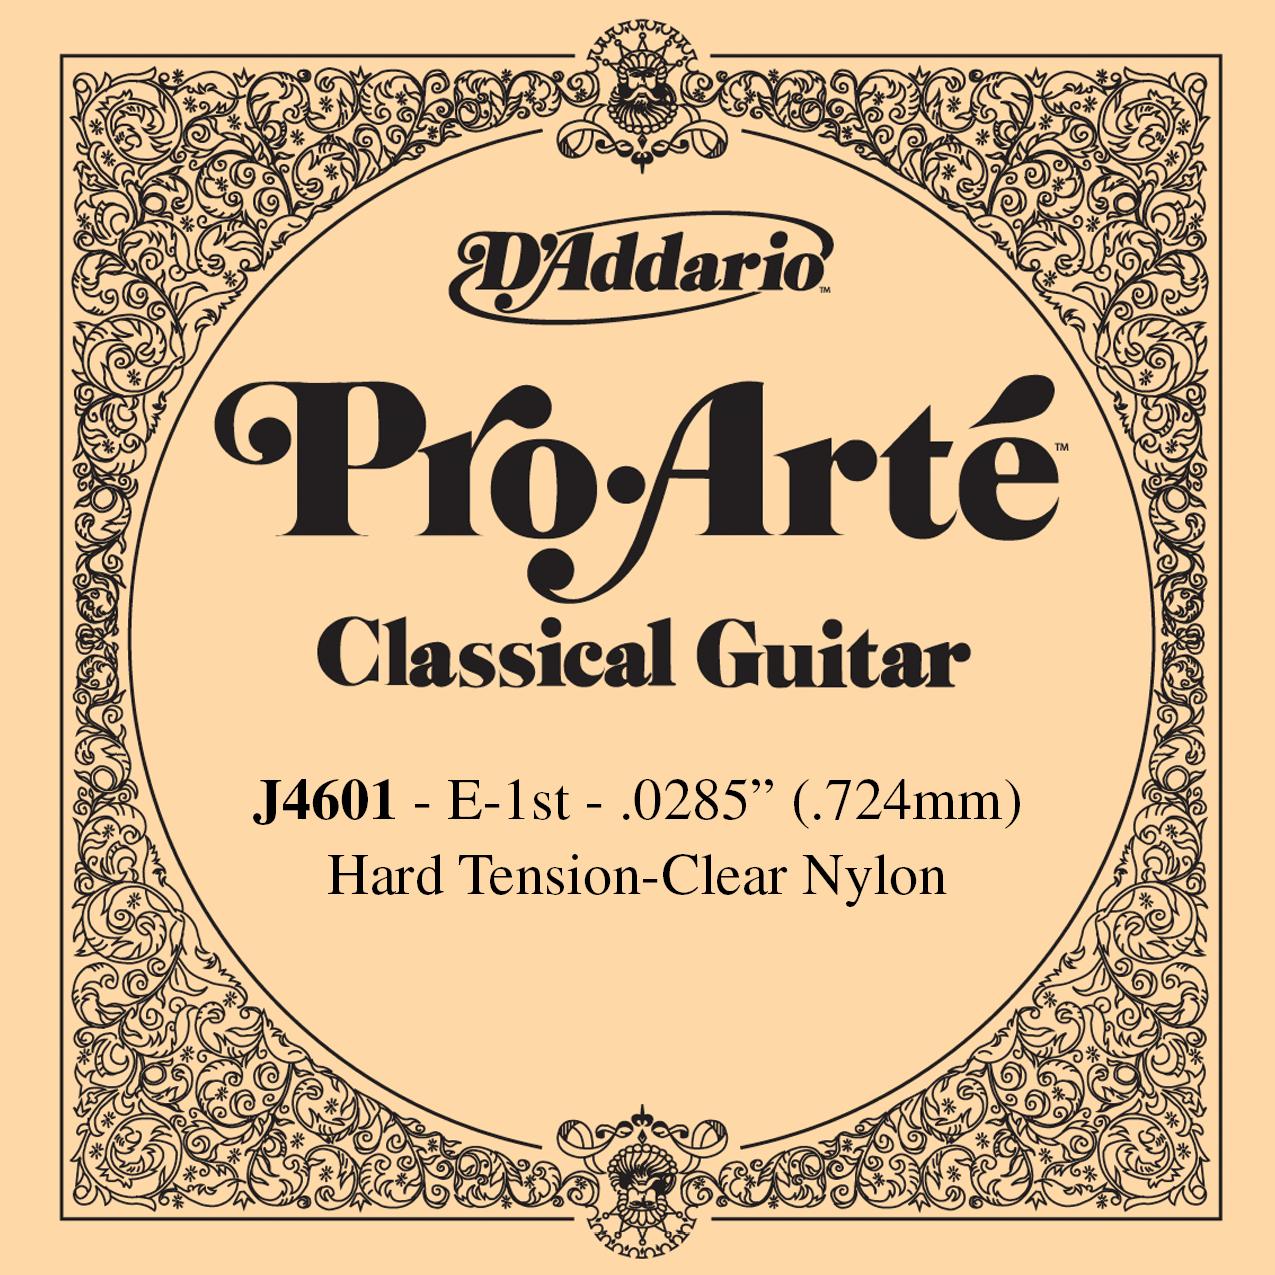 D'Addario J4601 Pro-Arte Nylon Classical Guitar Single String, Hard Tension, 1st String E